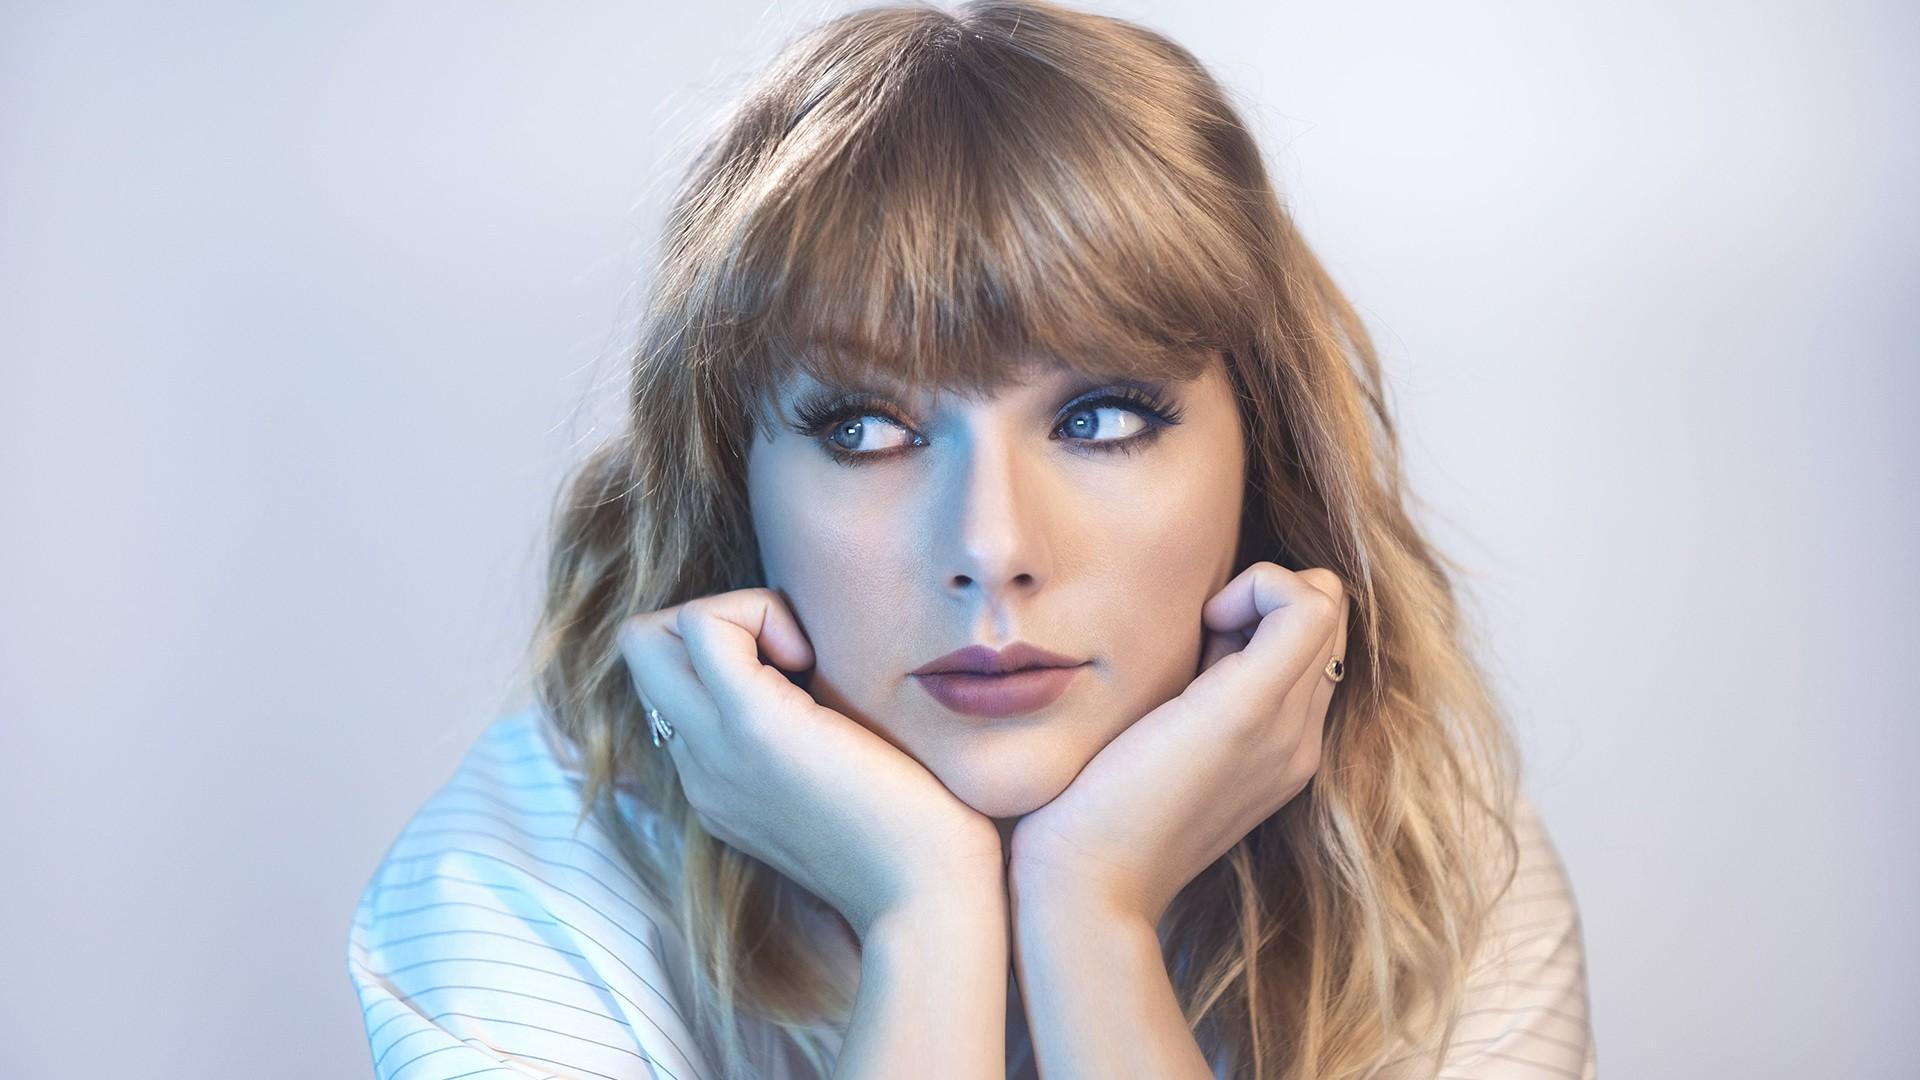 Taylor Swift PC Wallpaper